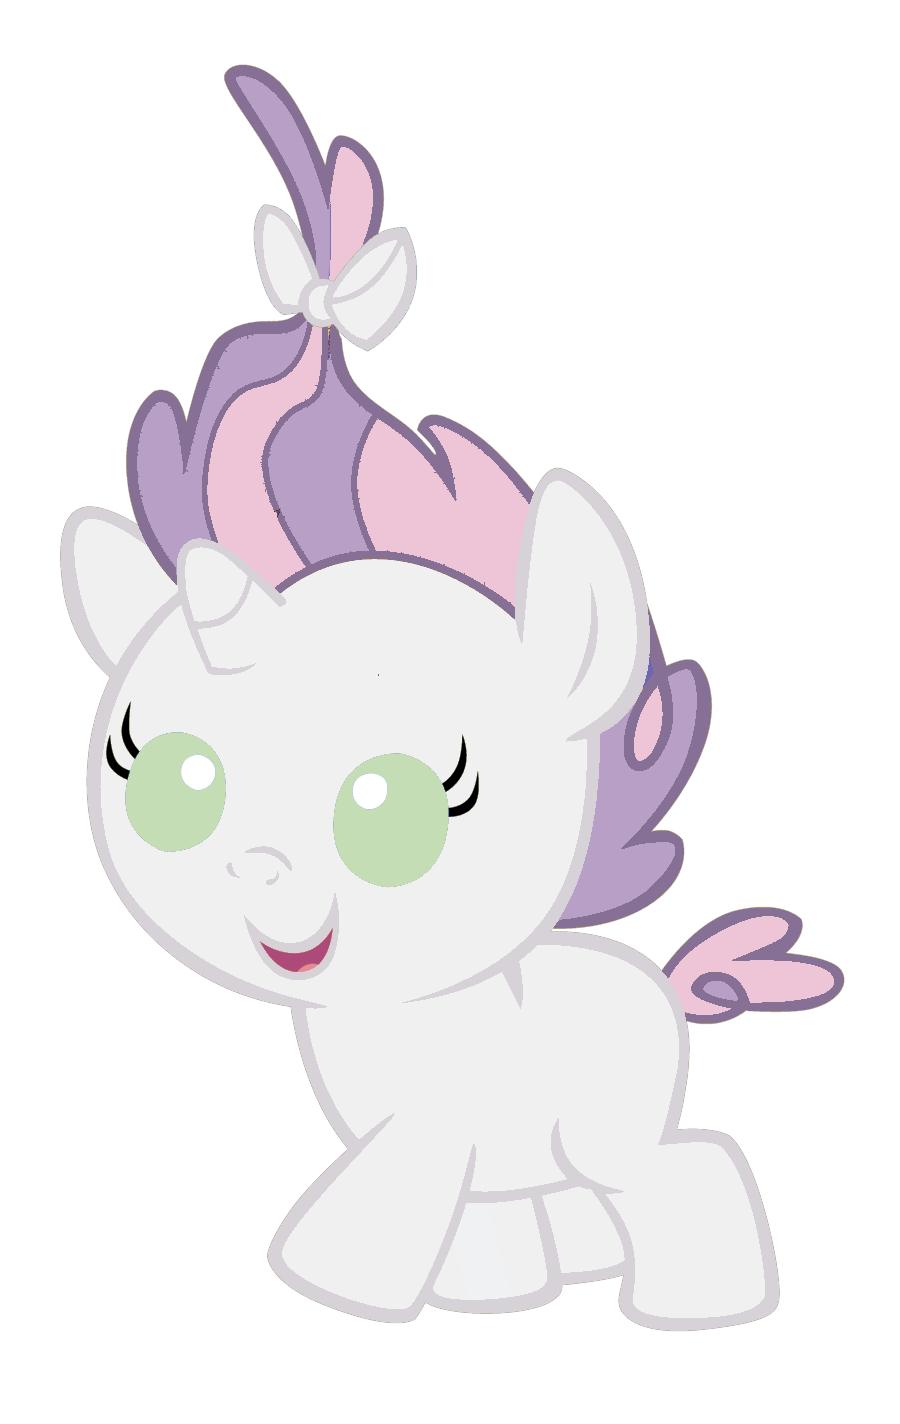 My little pony sweetie belle baby - photo#6